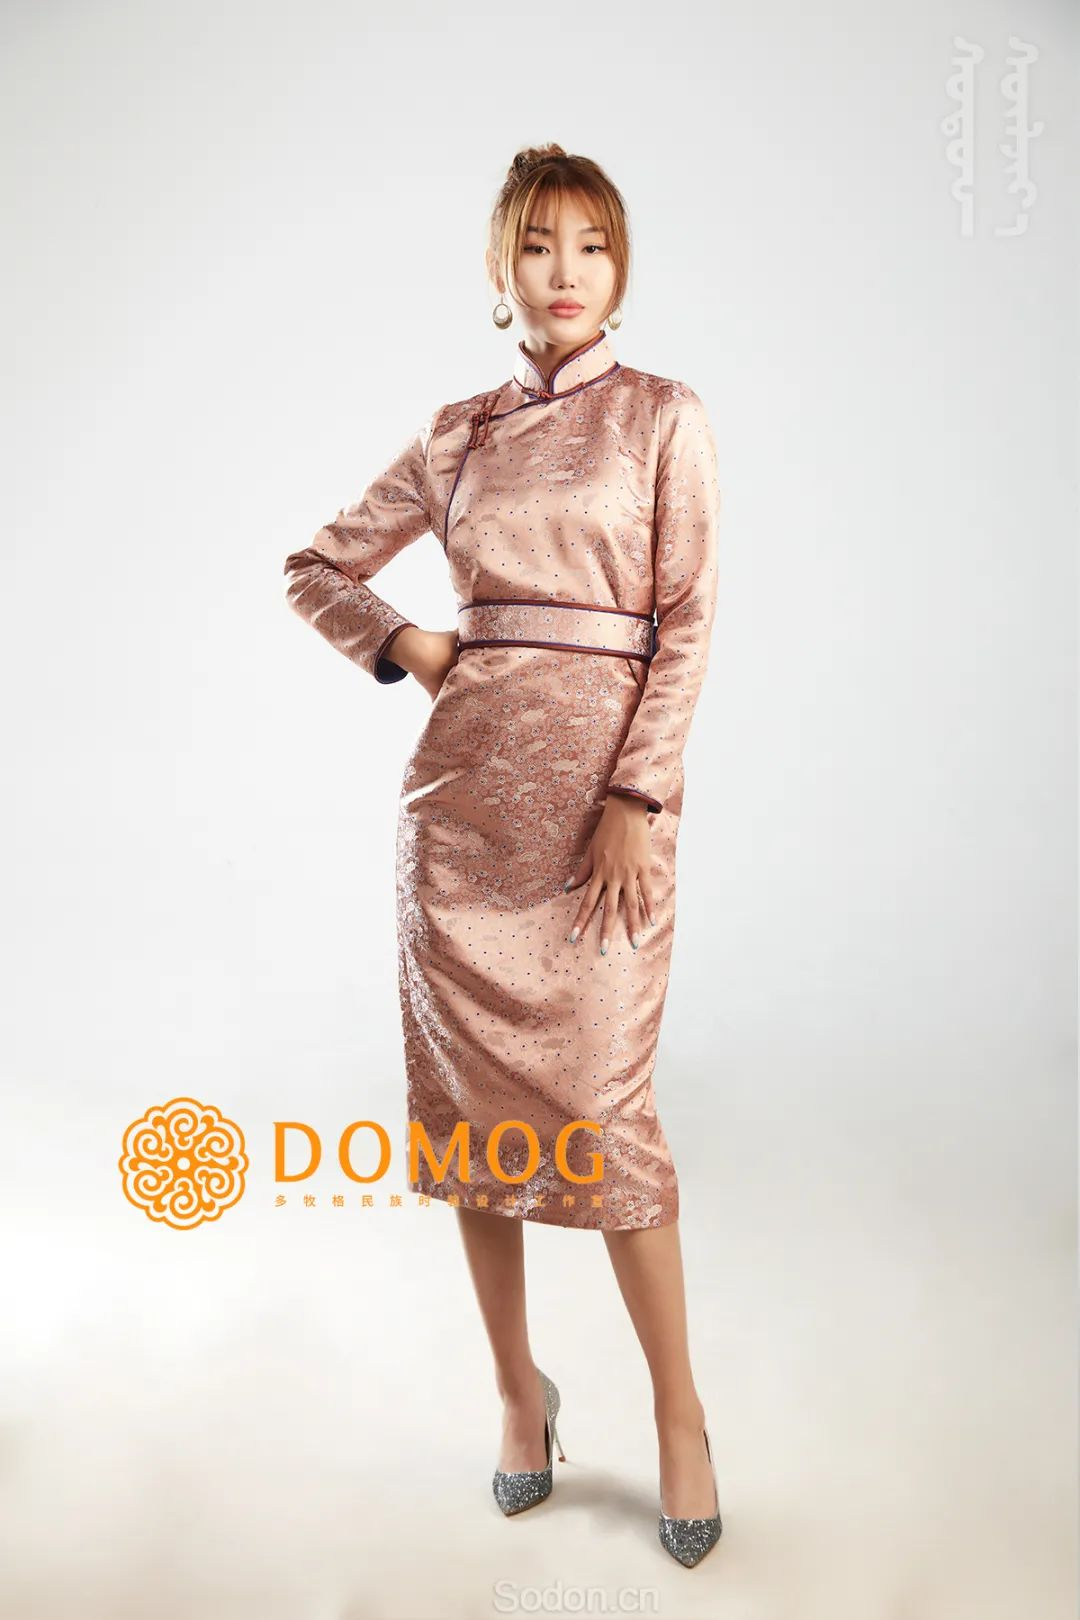 DOMOG 蒙古时装2020新款,民族与时尚的融合 第28张 DOMOG 蒙古时装2020新款,民族与时尚的融合 蒙古服饰